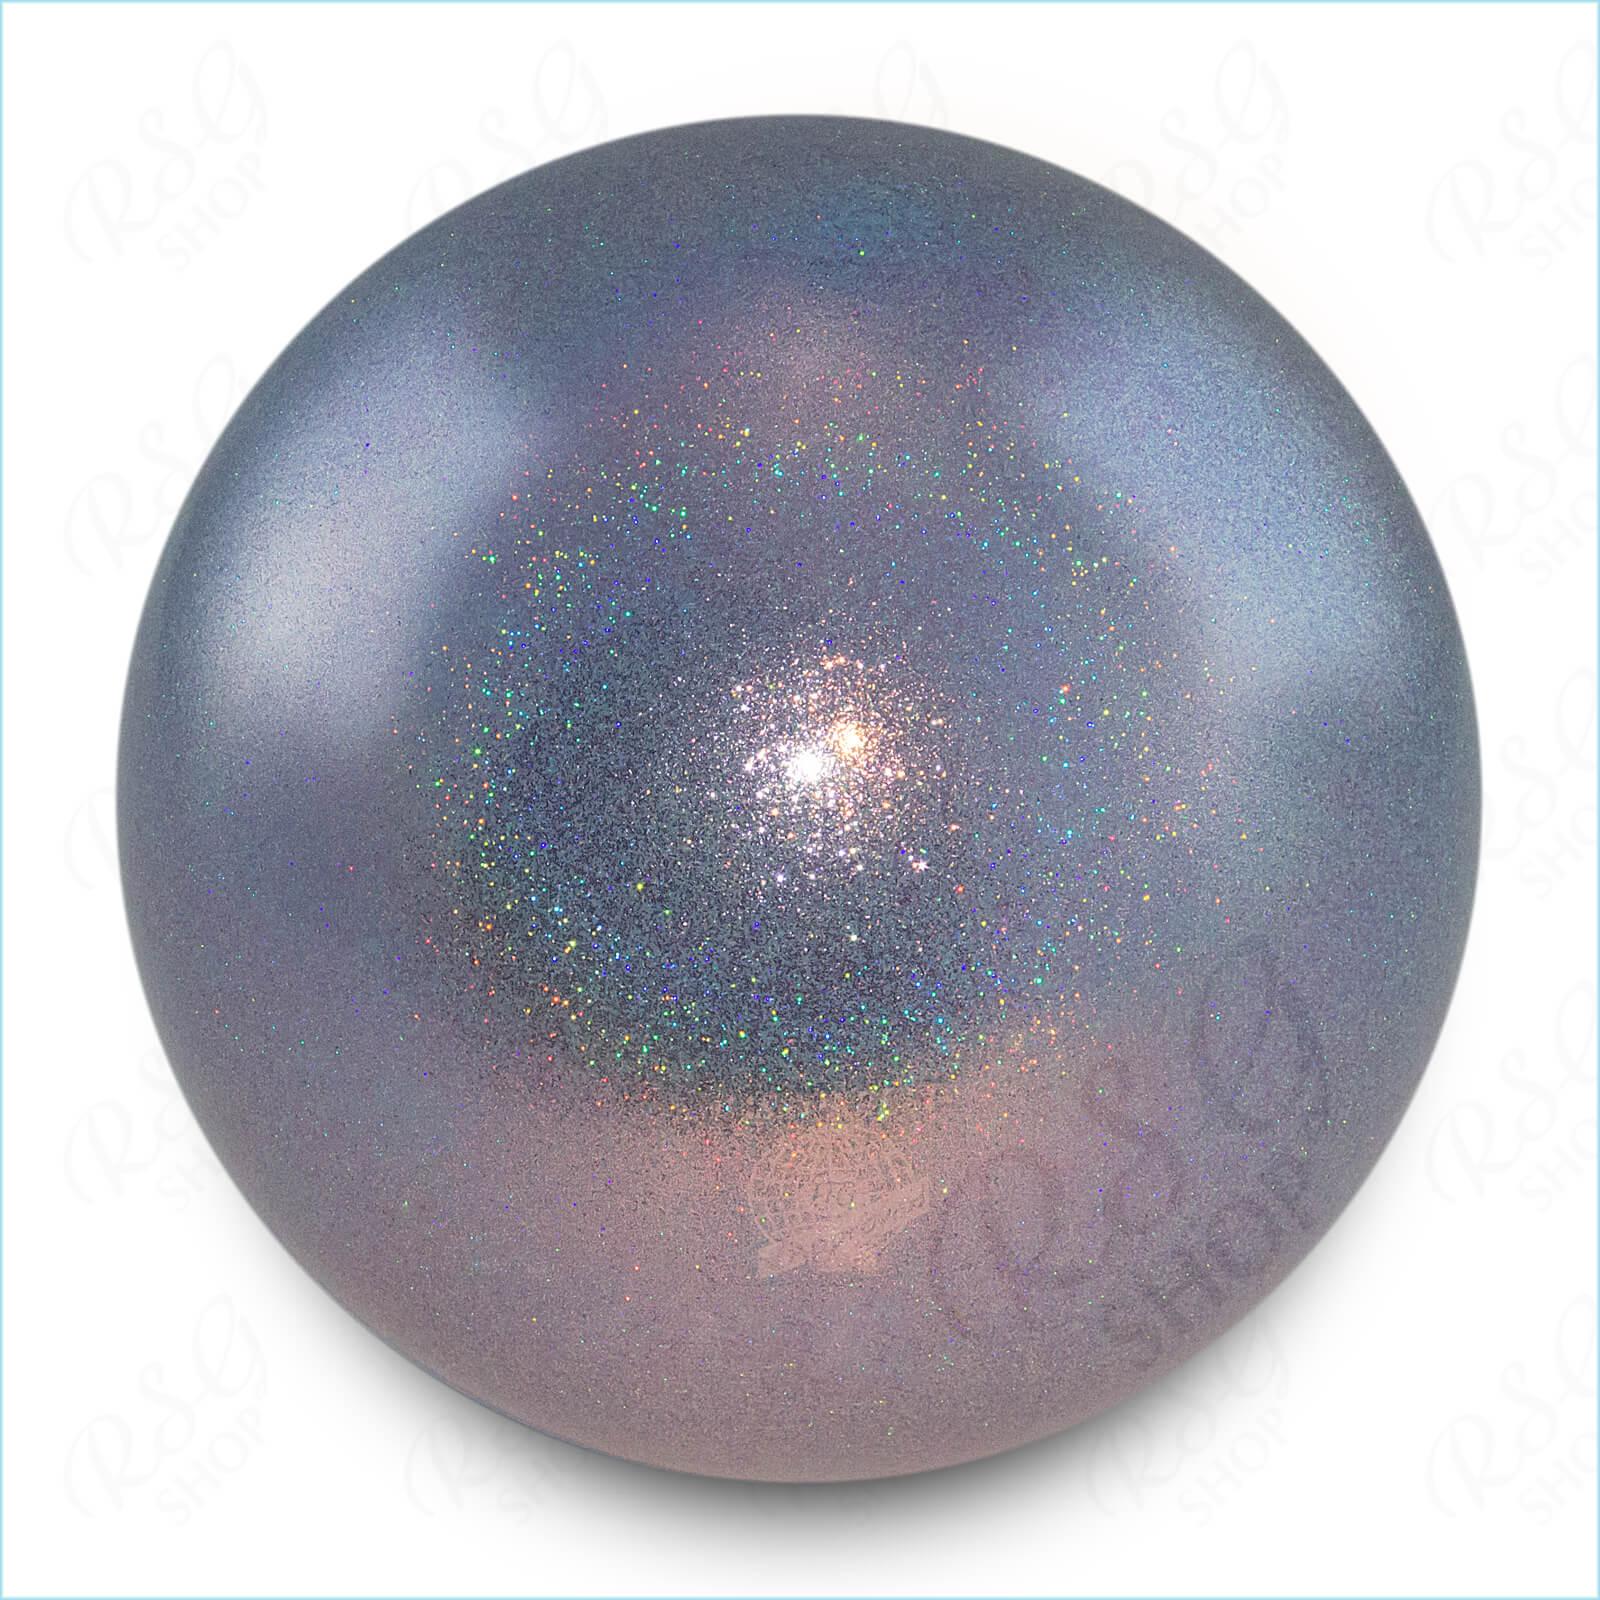 RSG Ball Pastorelli Wettkampfball 18cm FIG Gymnastikball Glitter HV ... d692542470d9